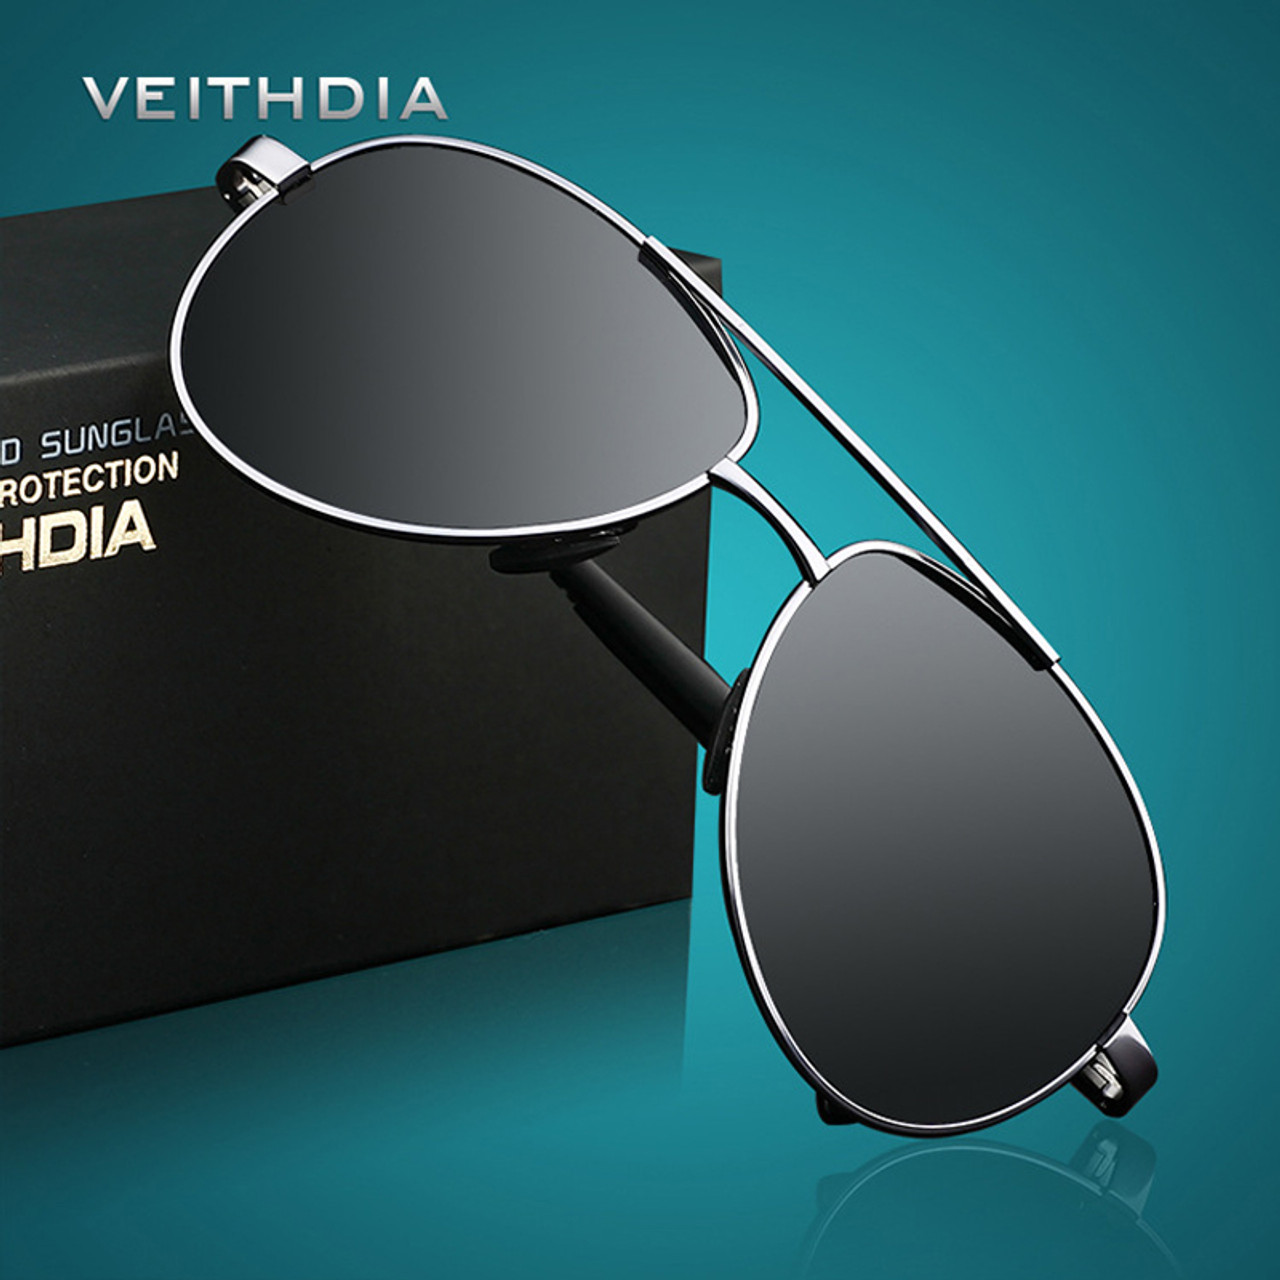 51dcf916431 VEITHDIA Men s Sunglasses Brand Designer Pilot Polarized Male Sun Glasses  Eyeglasses gafas oculos de sol masculino ...